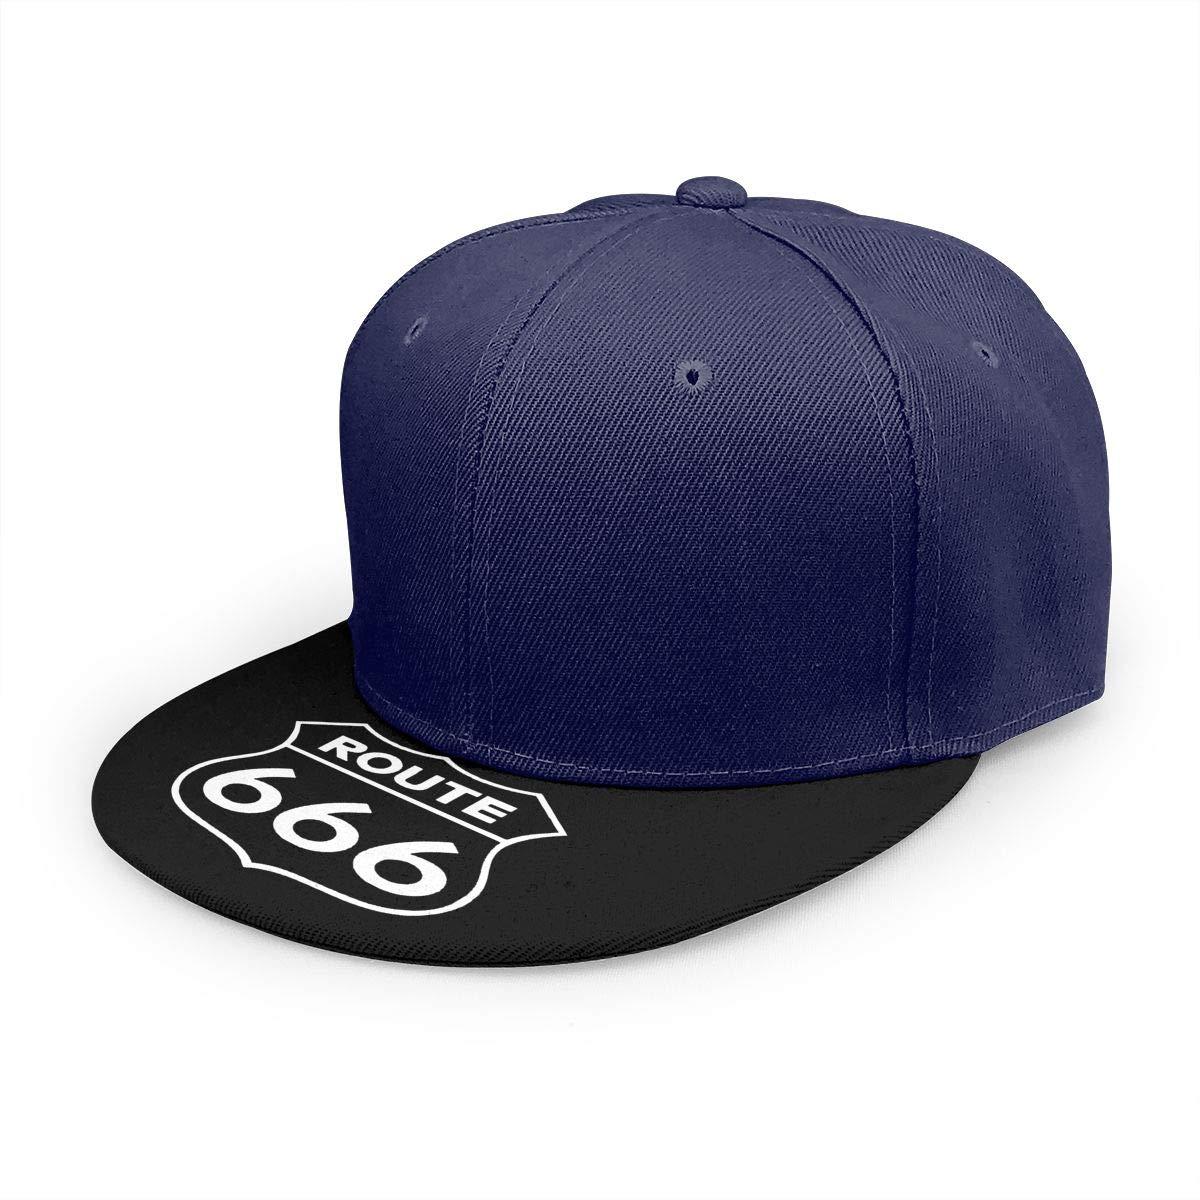 Adjustable Women Men Route 666 Print Baseball Cap Flat Brim Cap Hats Hip Hop Snapback Sun Hat Boys Girls Navy by Apolonia